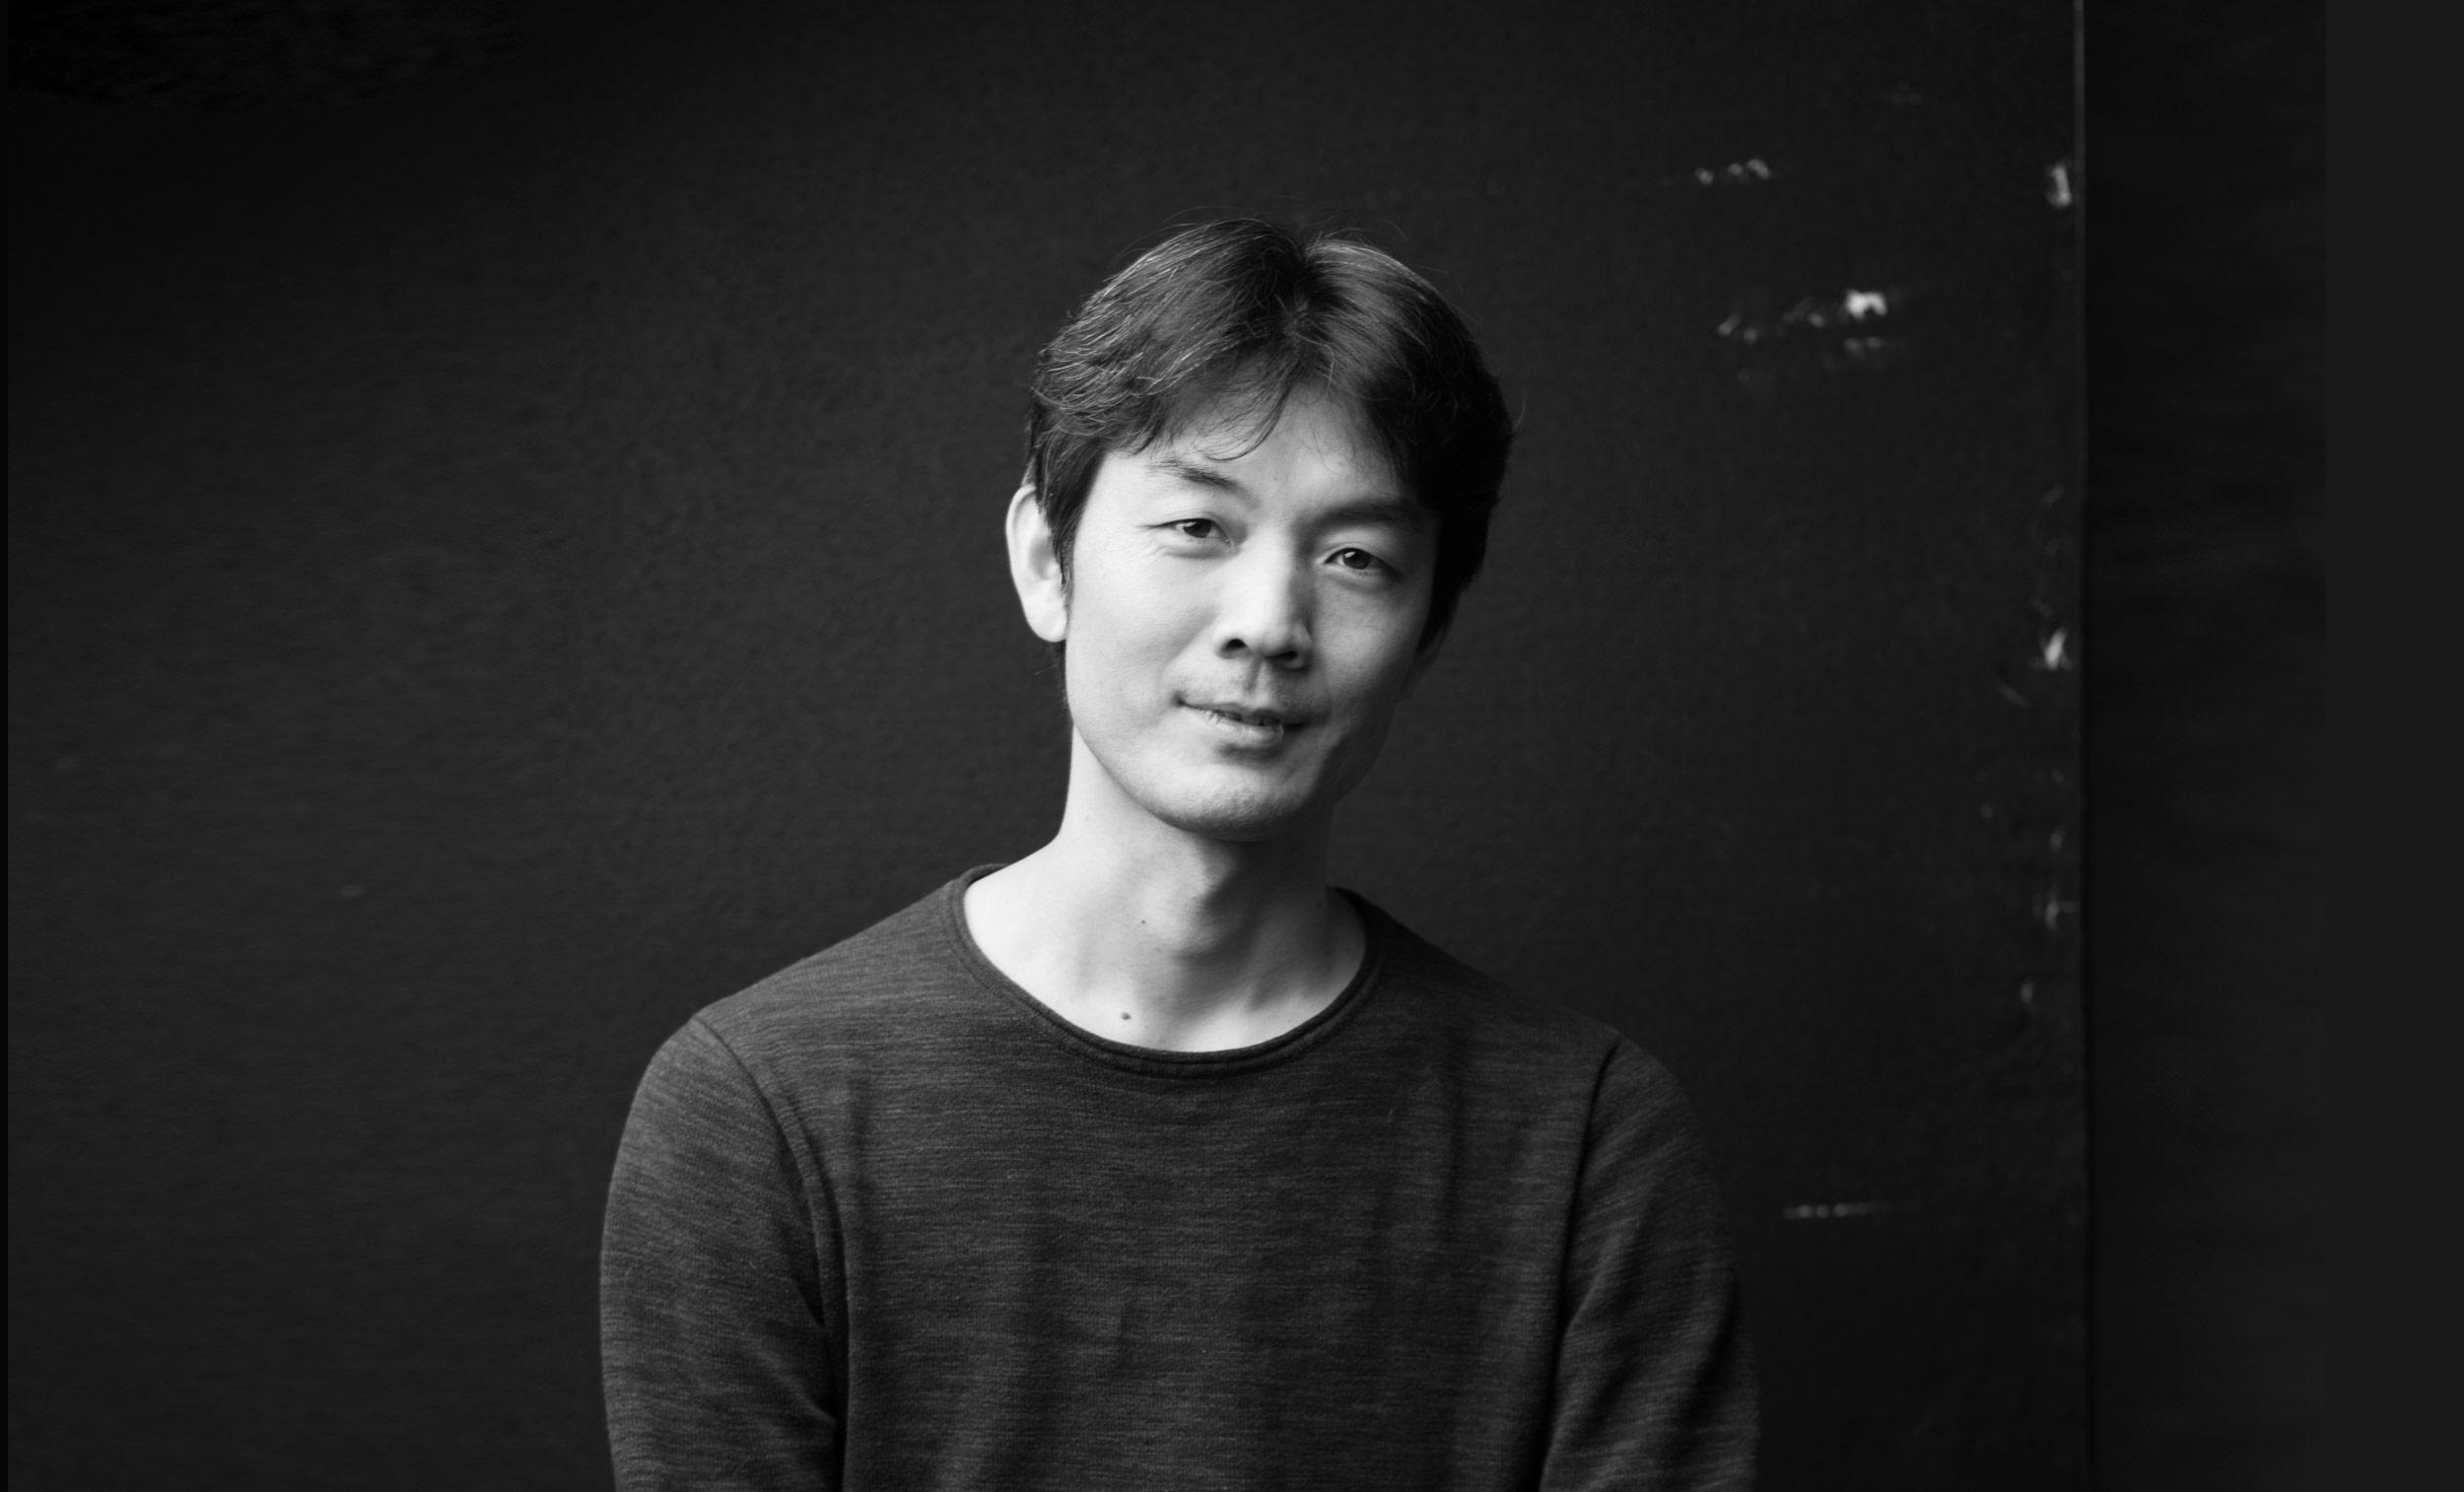 Yohei Sasaki